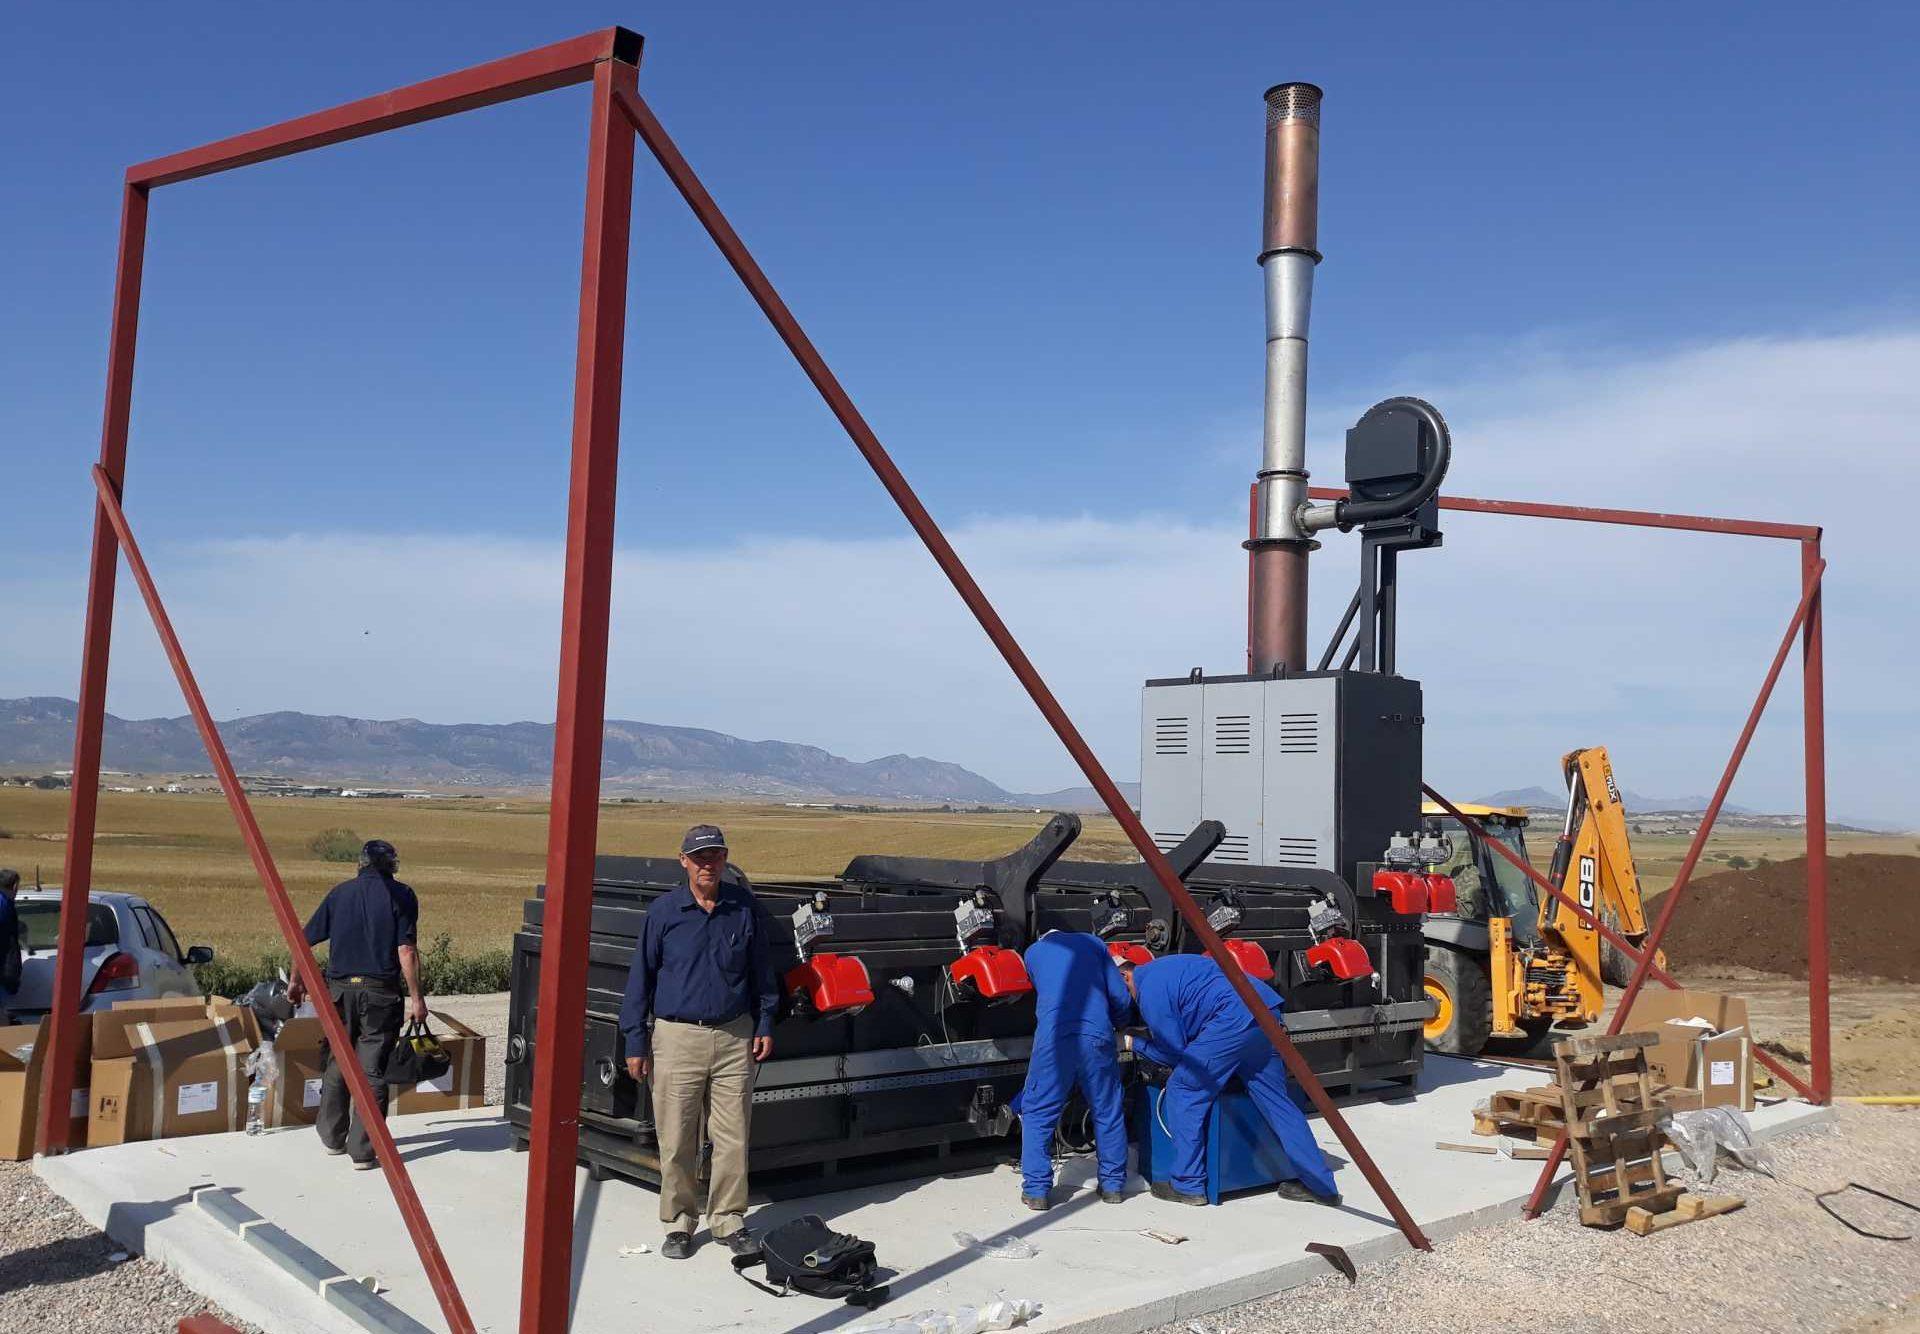 Inciner8 team on site installation in Africa